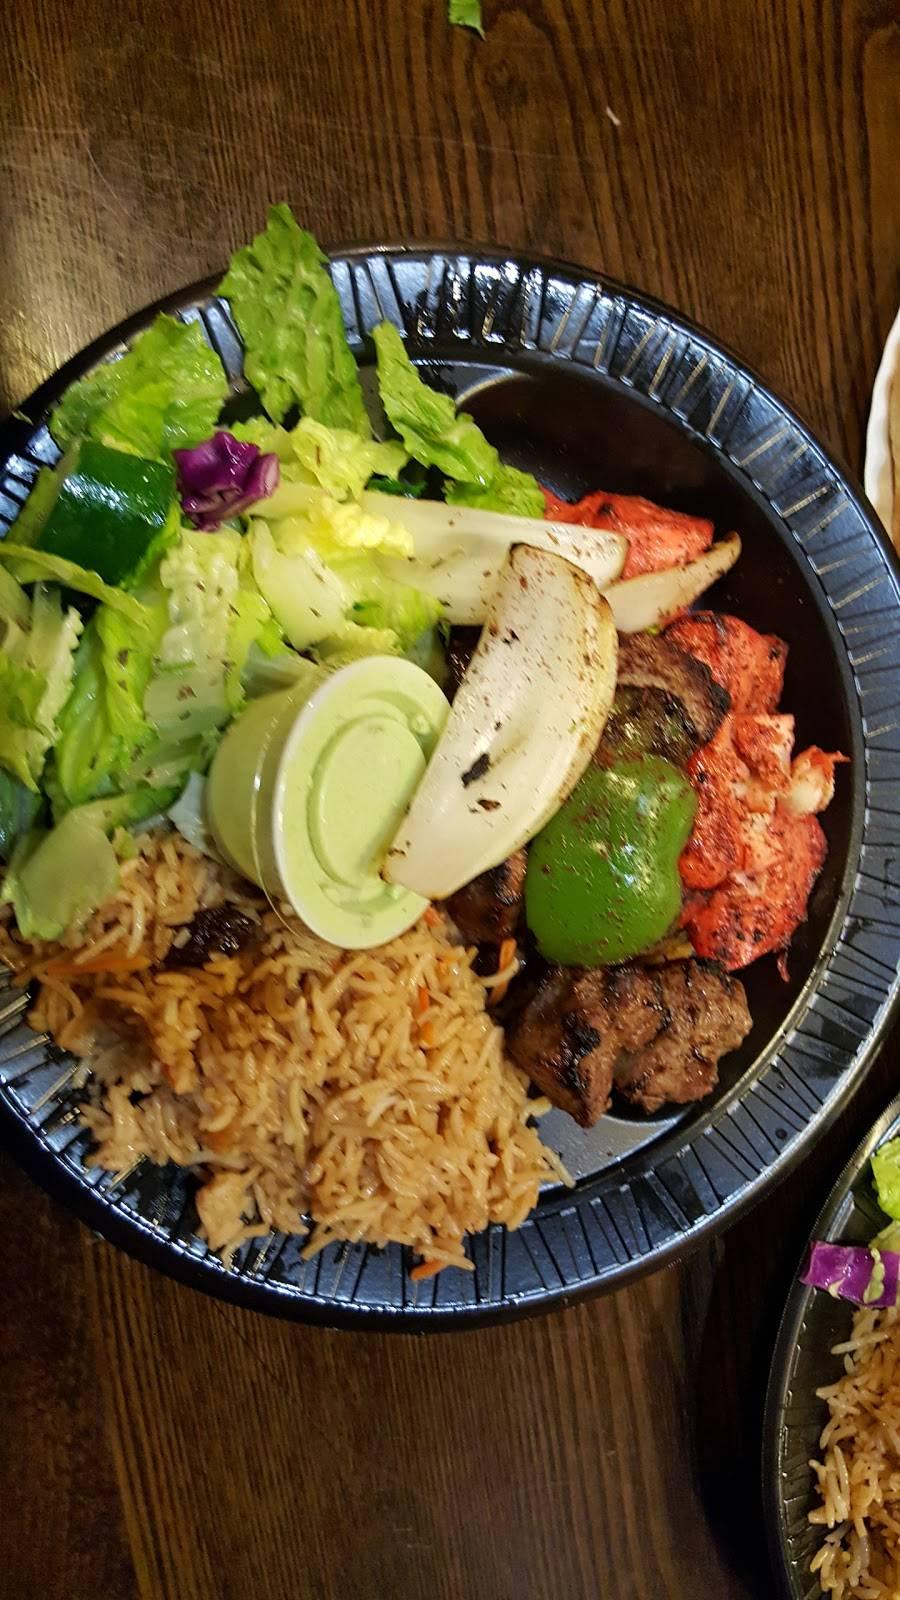 Maiwand Kabob | restaurant | 5467 Harpers Farm Rd, Columbia, MD 21044, USA | 4109927754 OR +1 410-992-7754